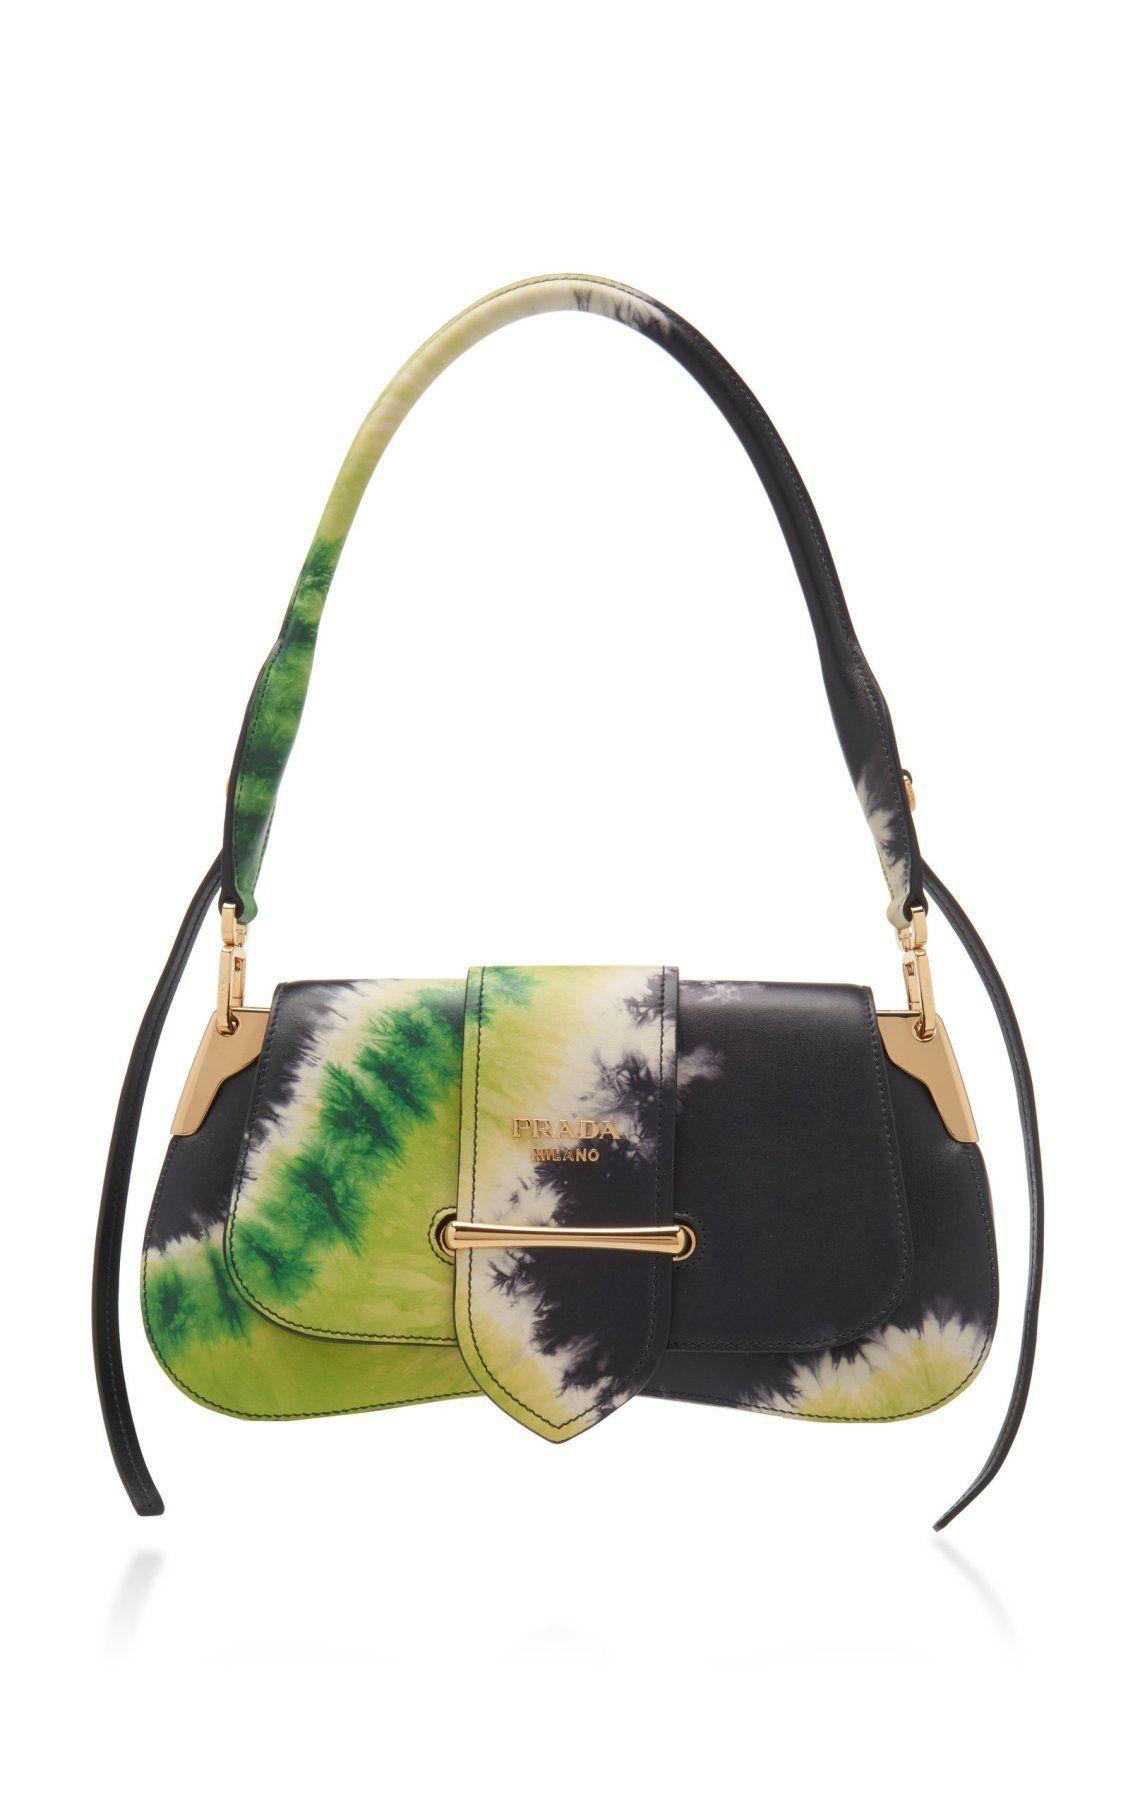 Tie-Dye City Calf Pattina Bag by Prada Spring Summer 2019   Moda Operandi   summerpocketbooks 8eb4a574105